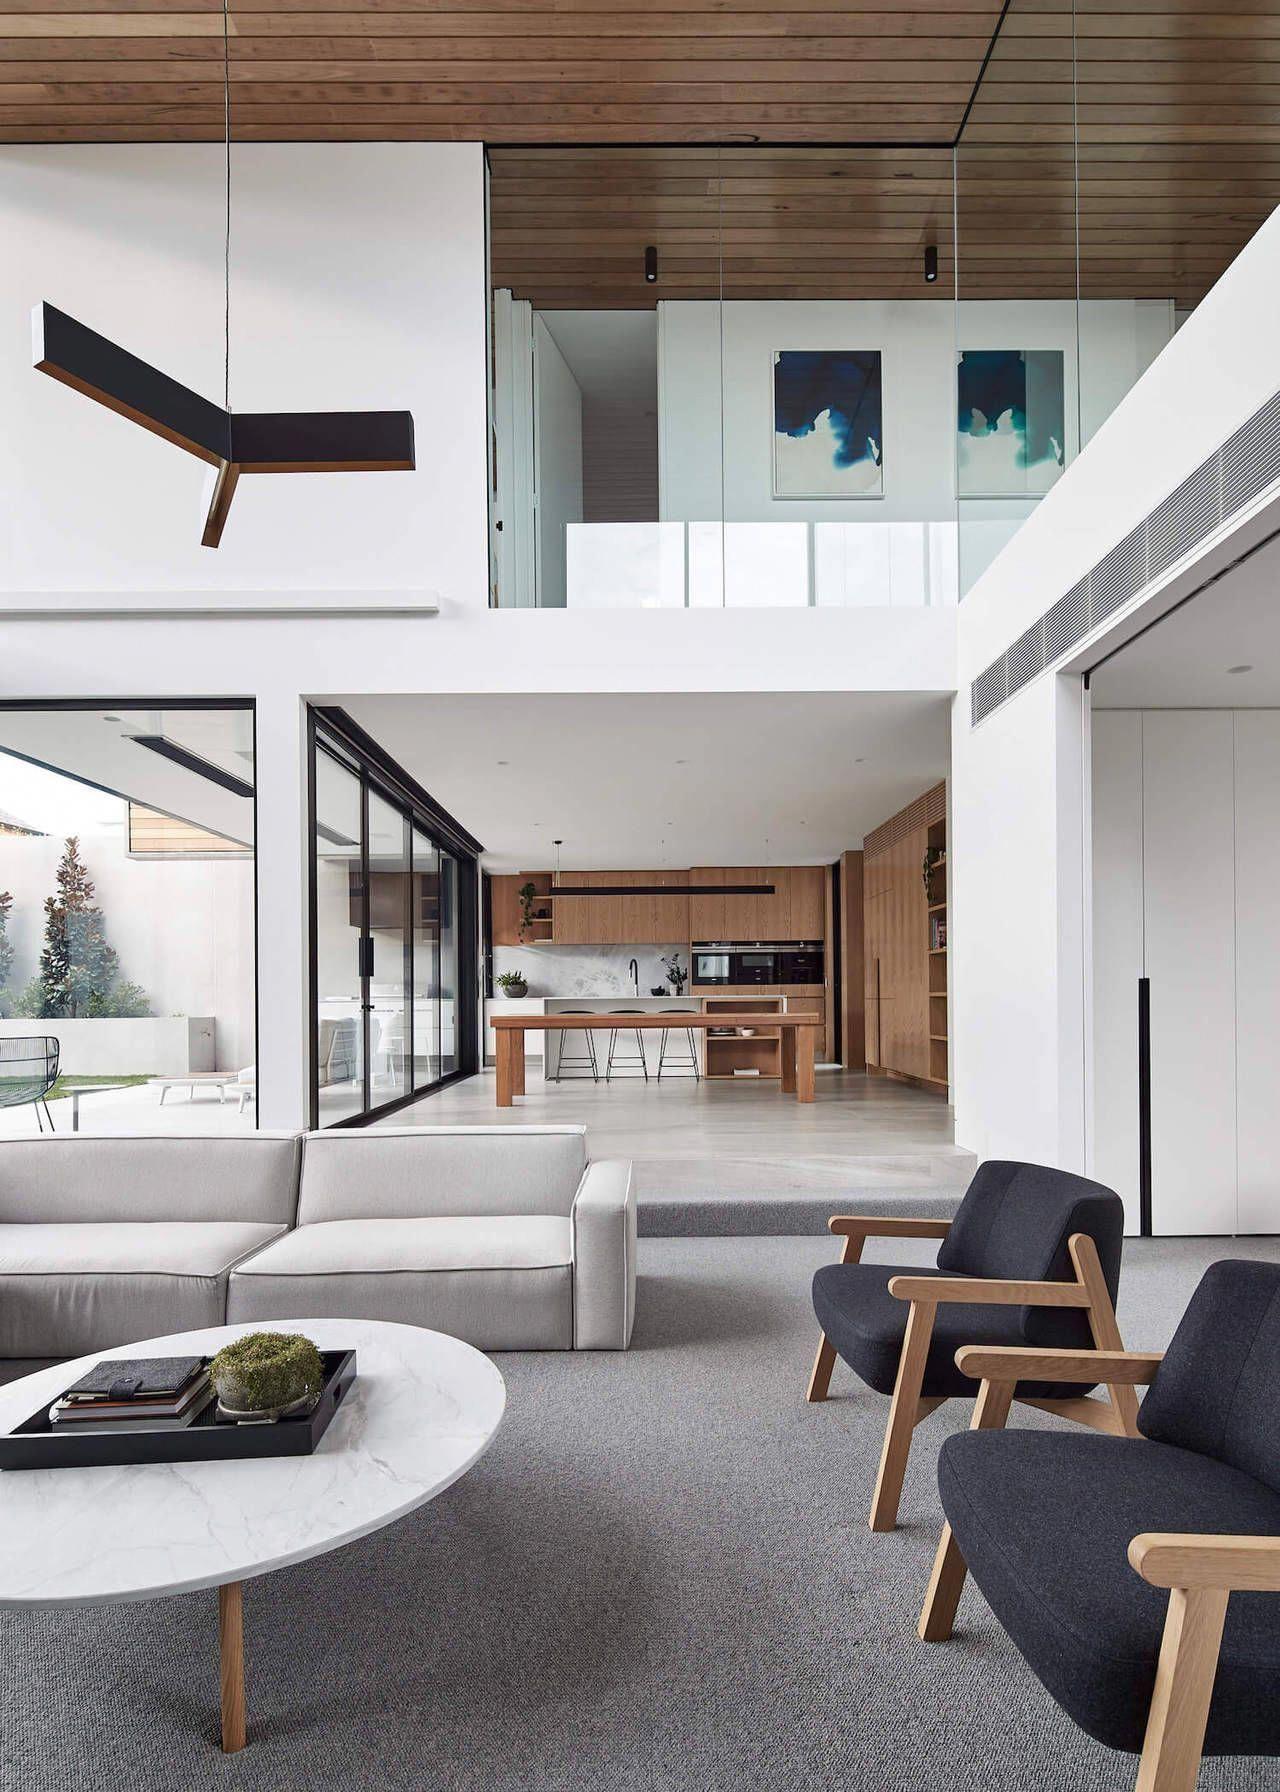 Arredamenti Interni Case Moderne luxury houses #homedecor #interiordesign #artdeco